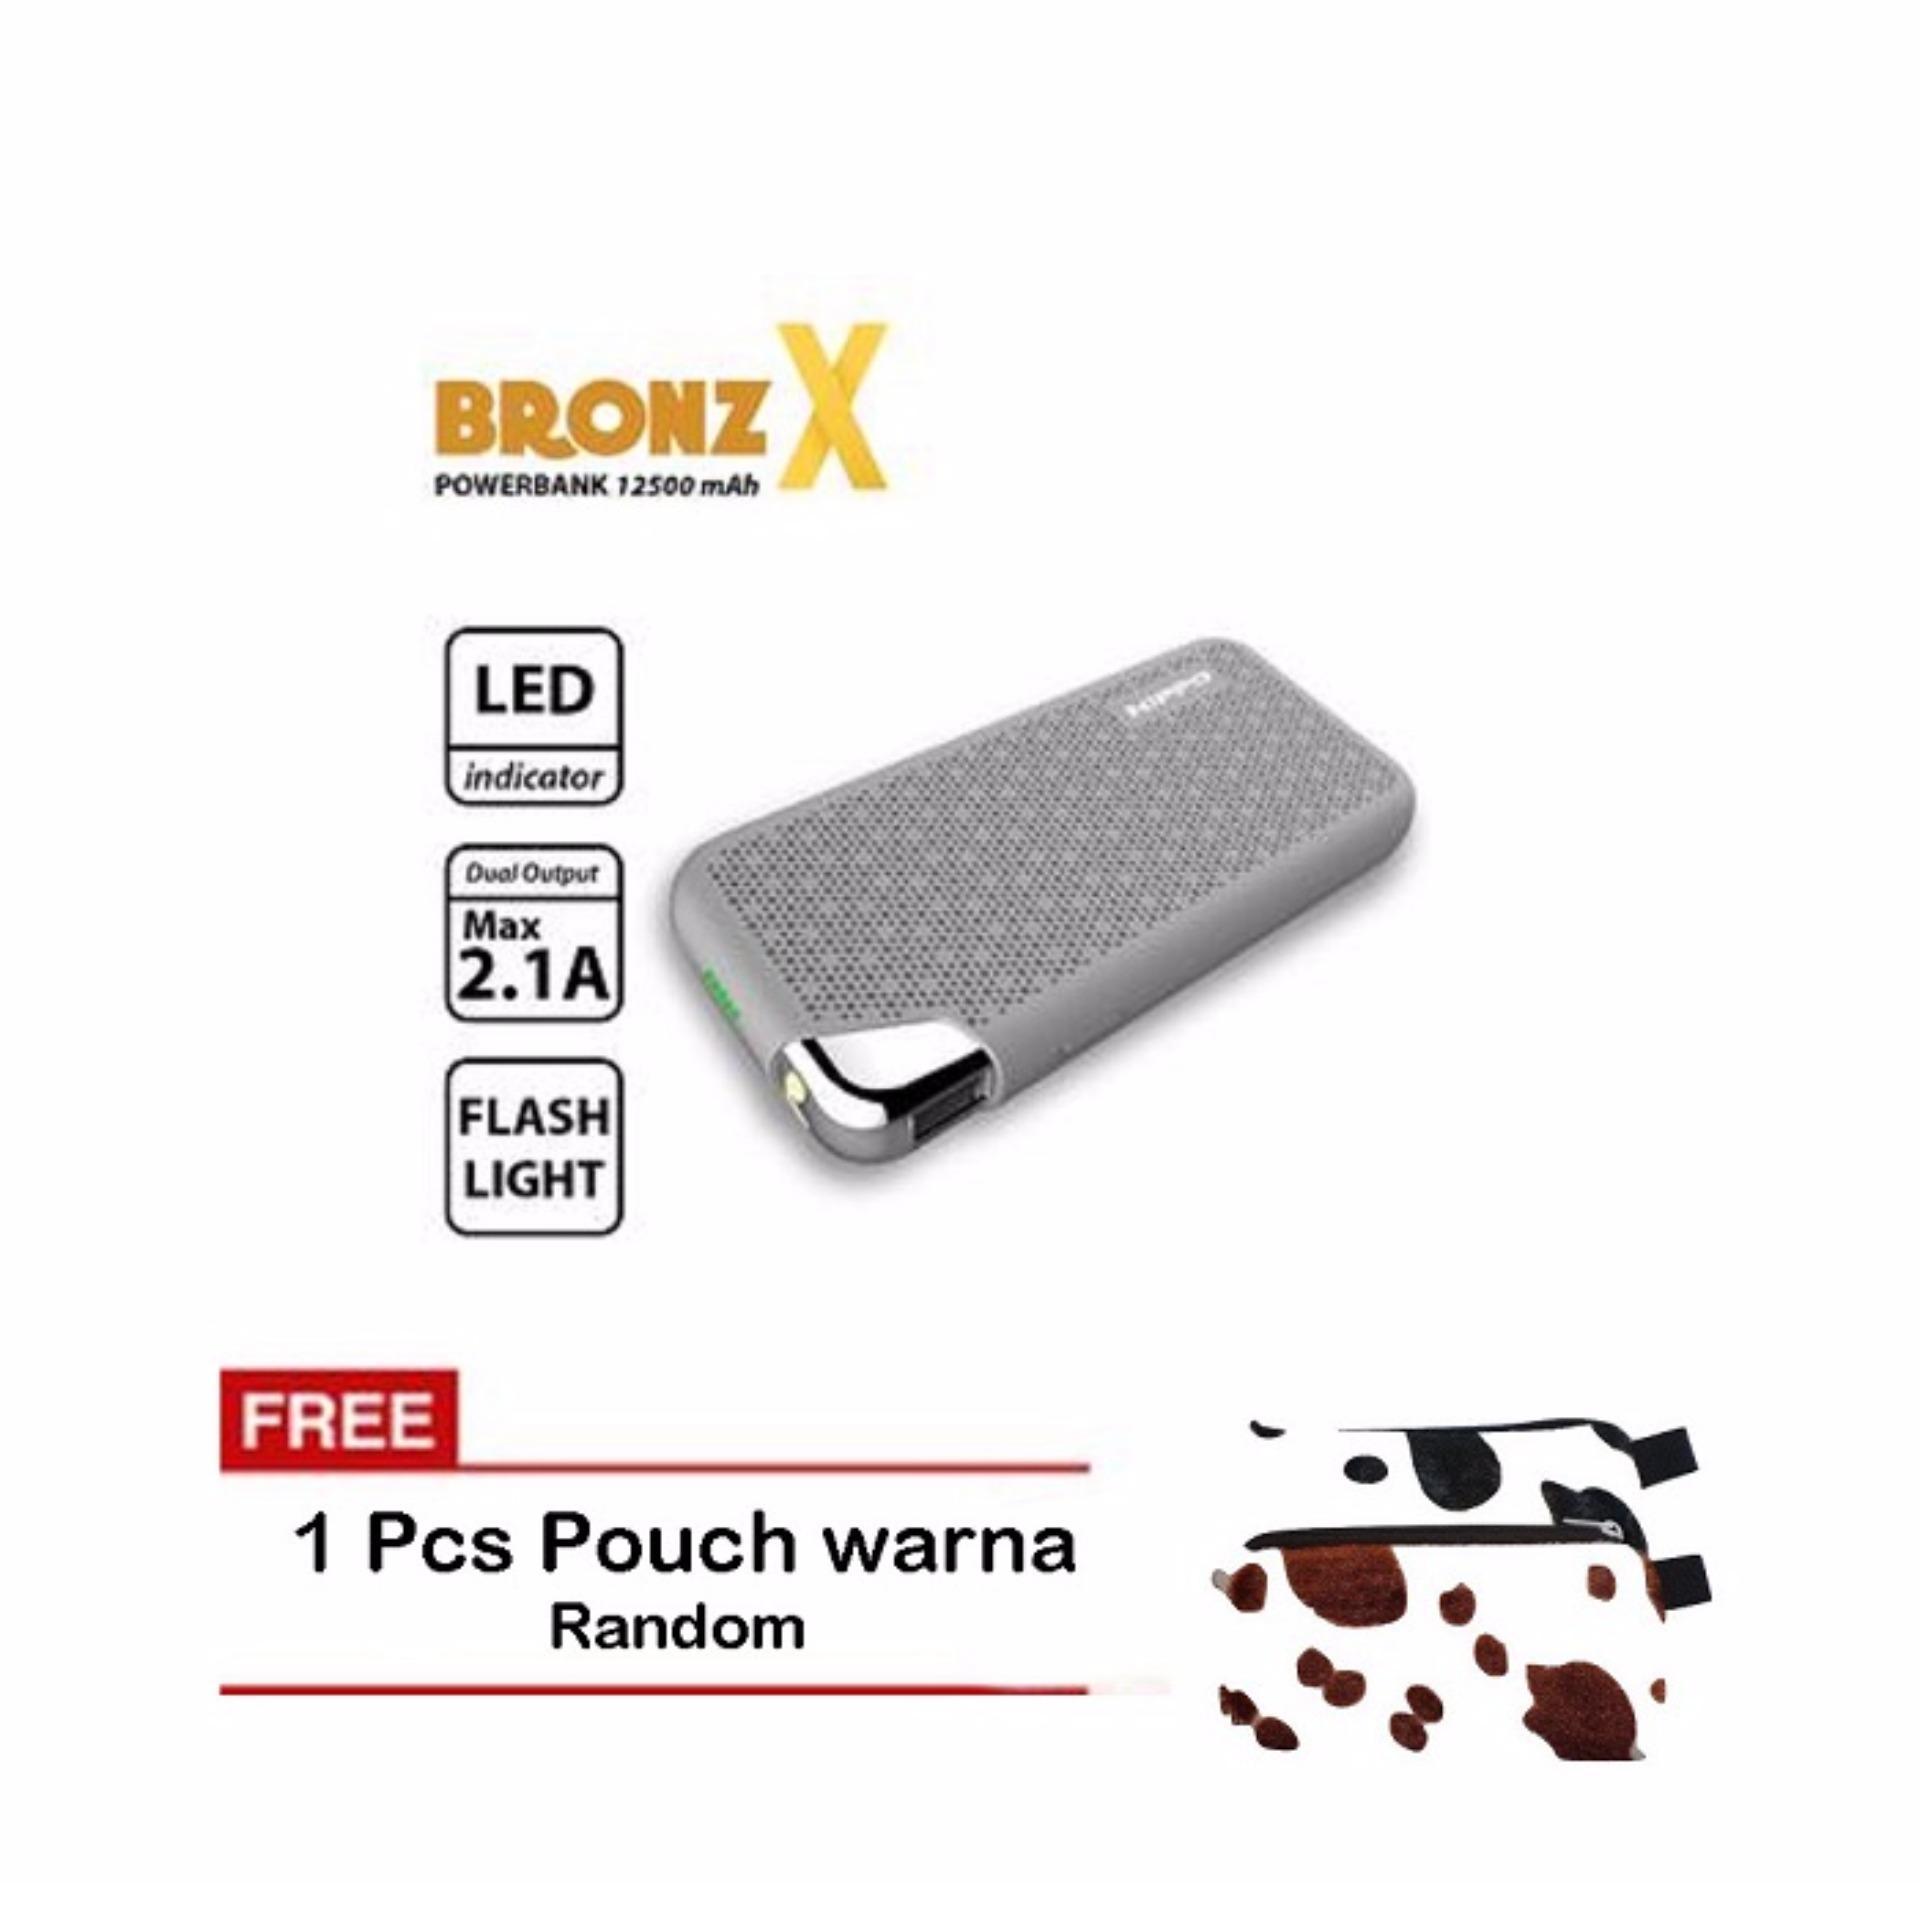 Hippo Power Bank Bronzx 12500mah Abu Abu Pouch Daftar Update Harga Terbaru Indonesia